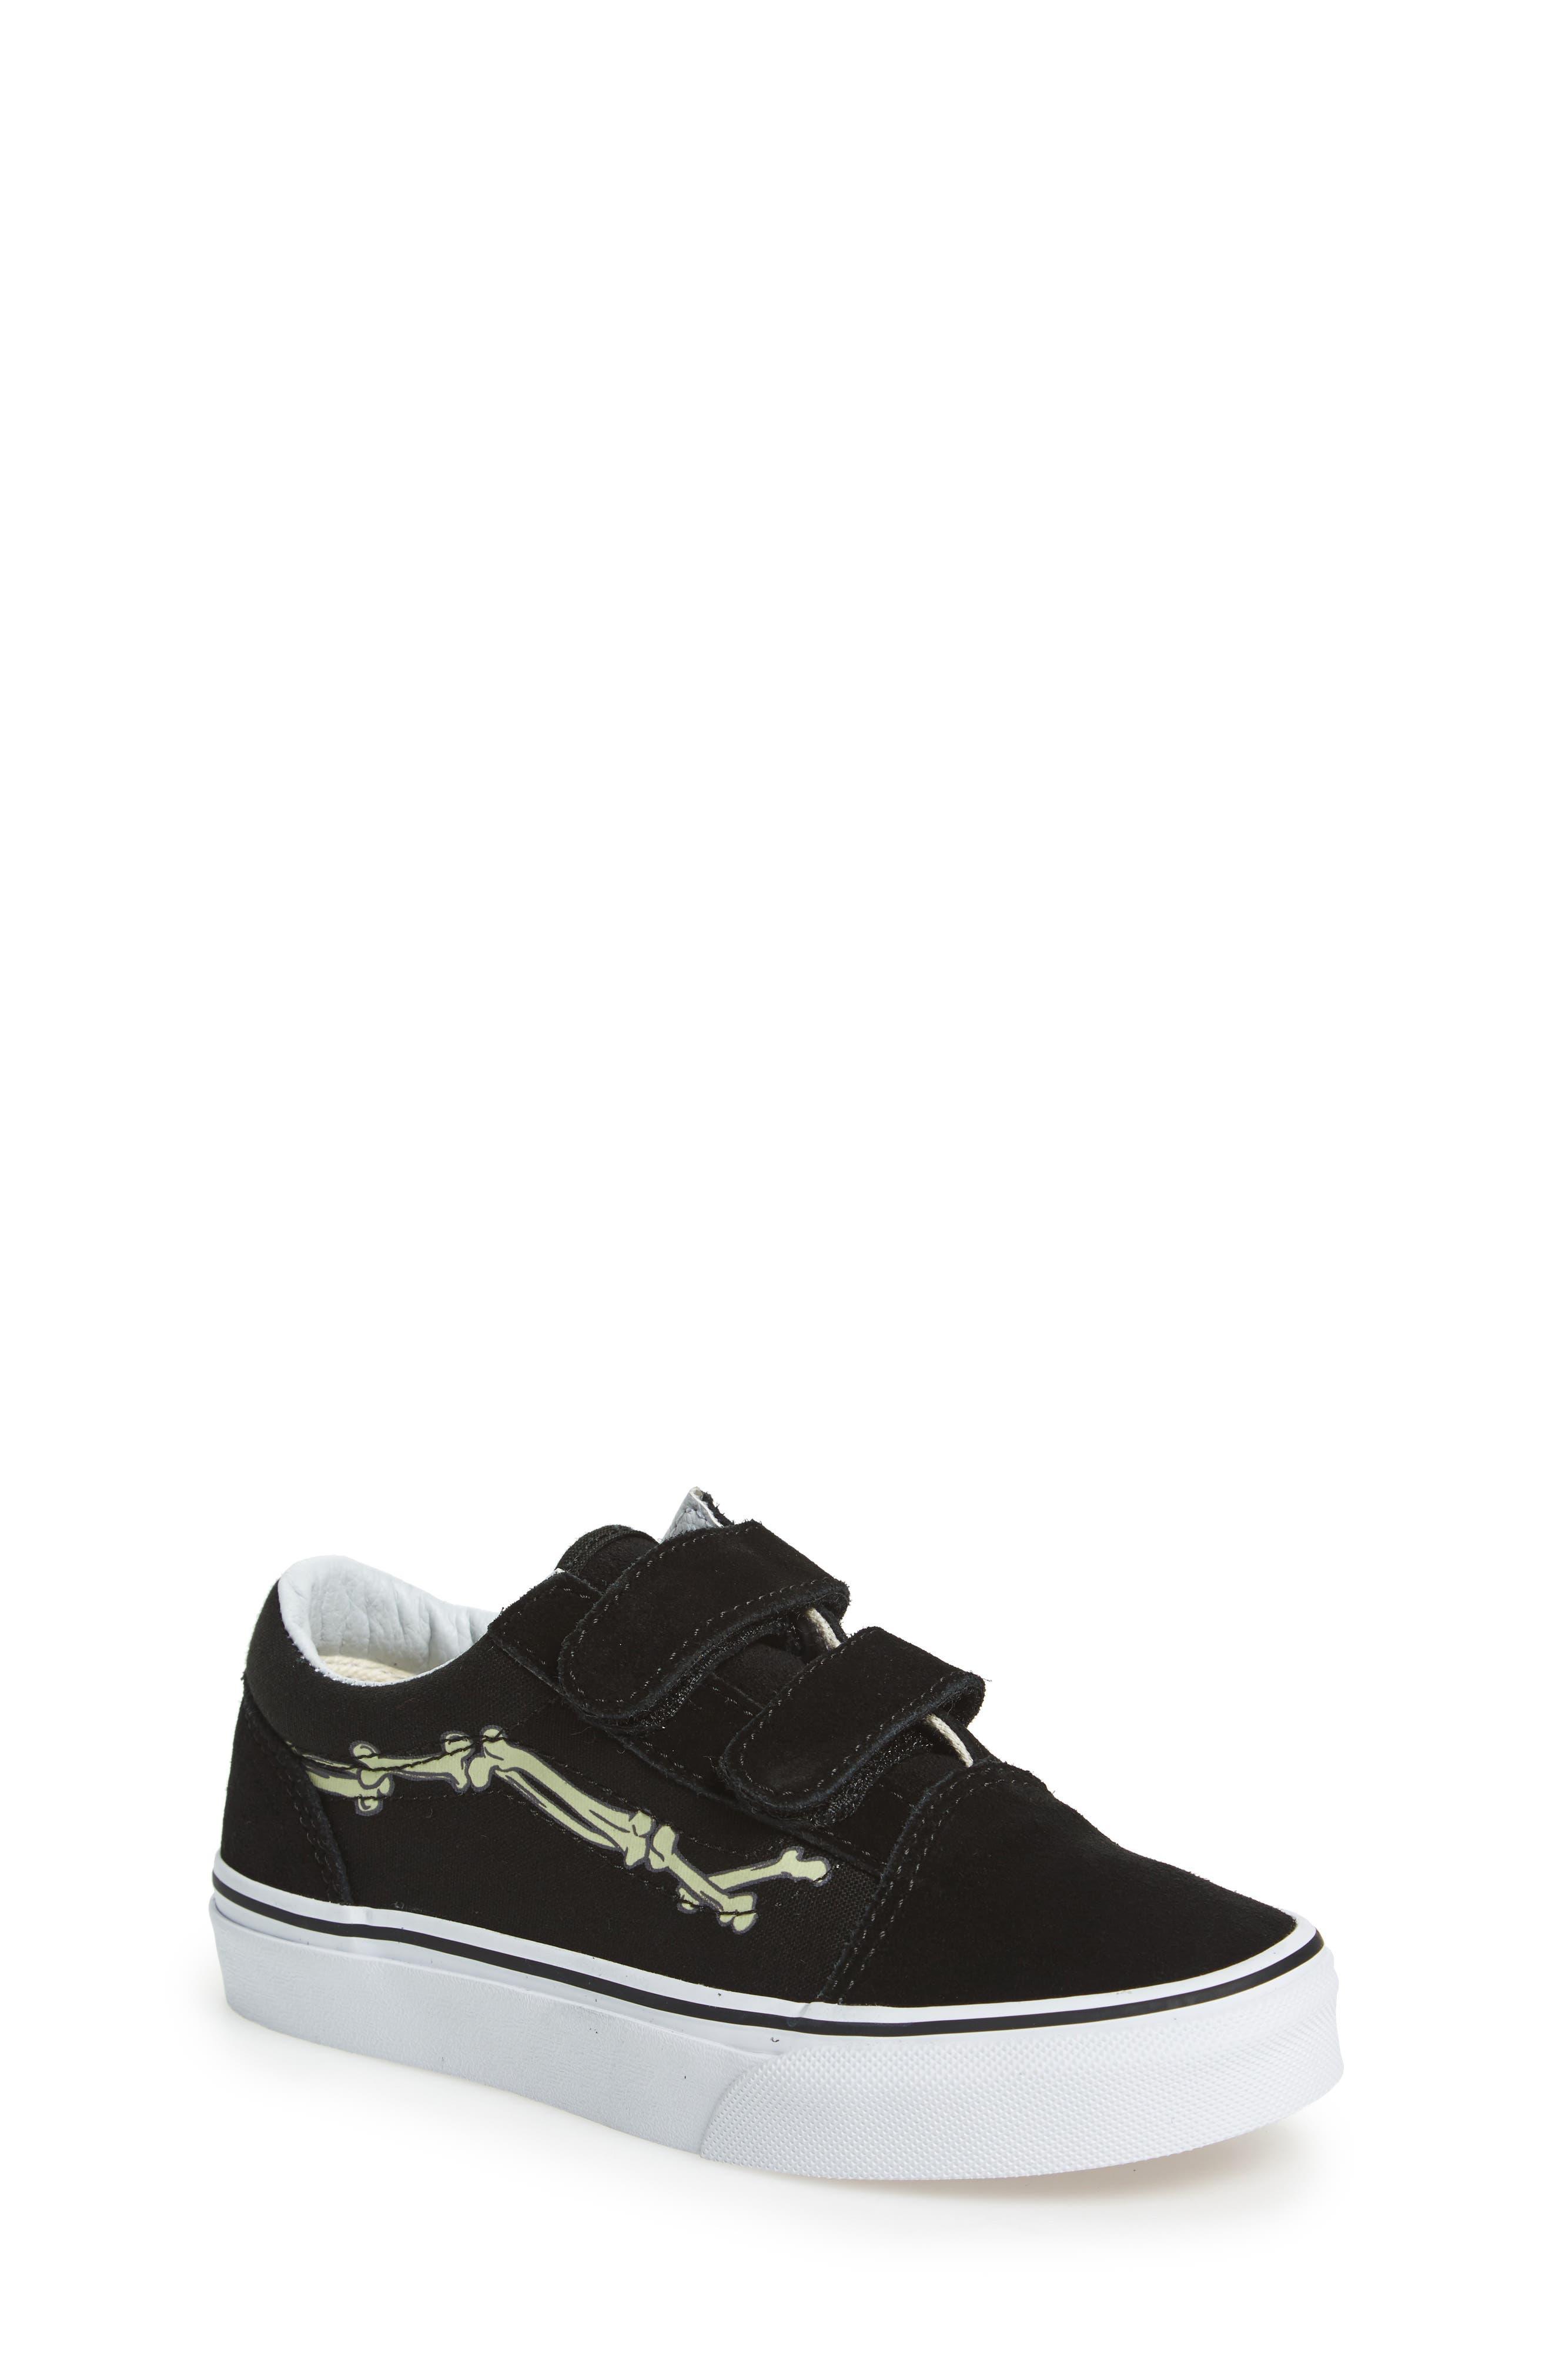 Old Skool Skate Sneaker,                         Main,                         color, Glow Bones Black/ White